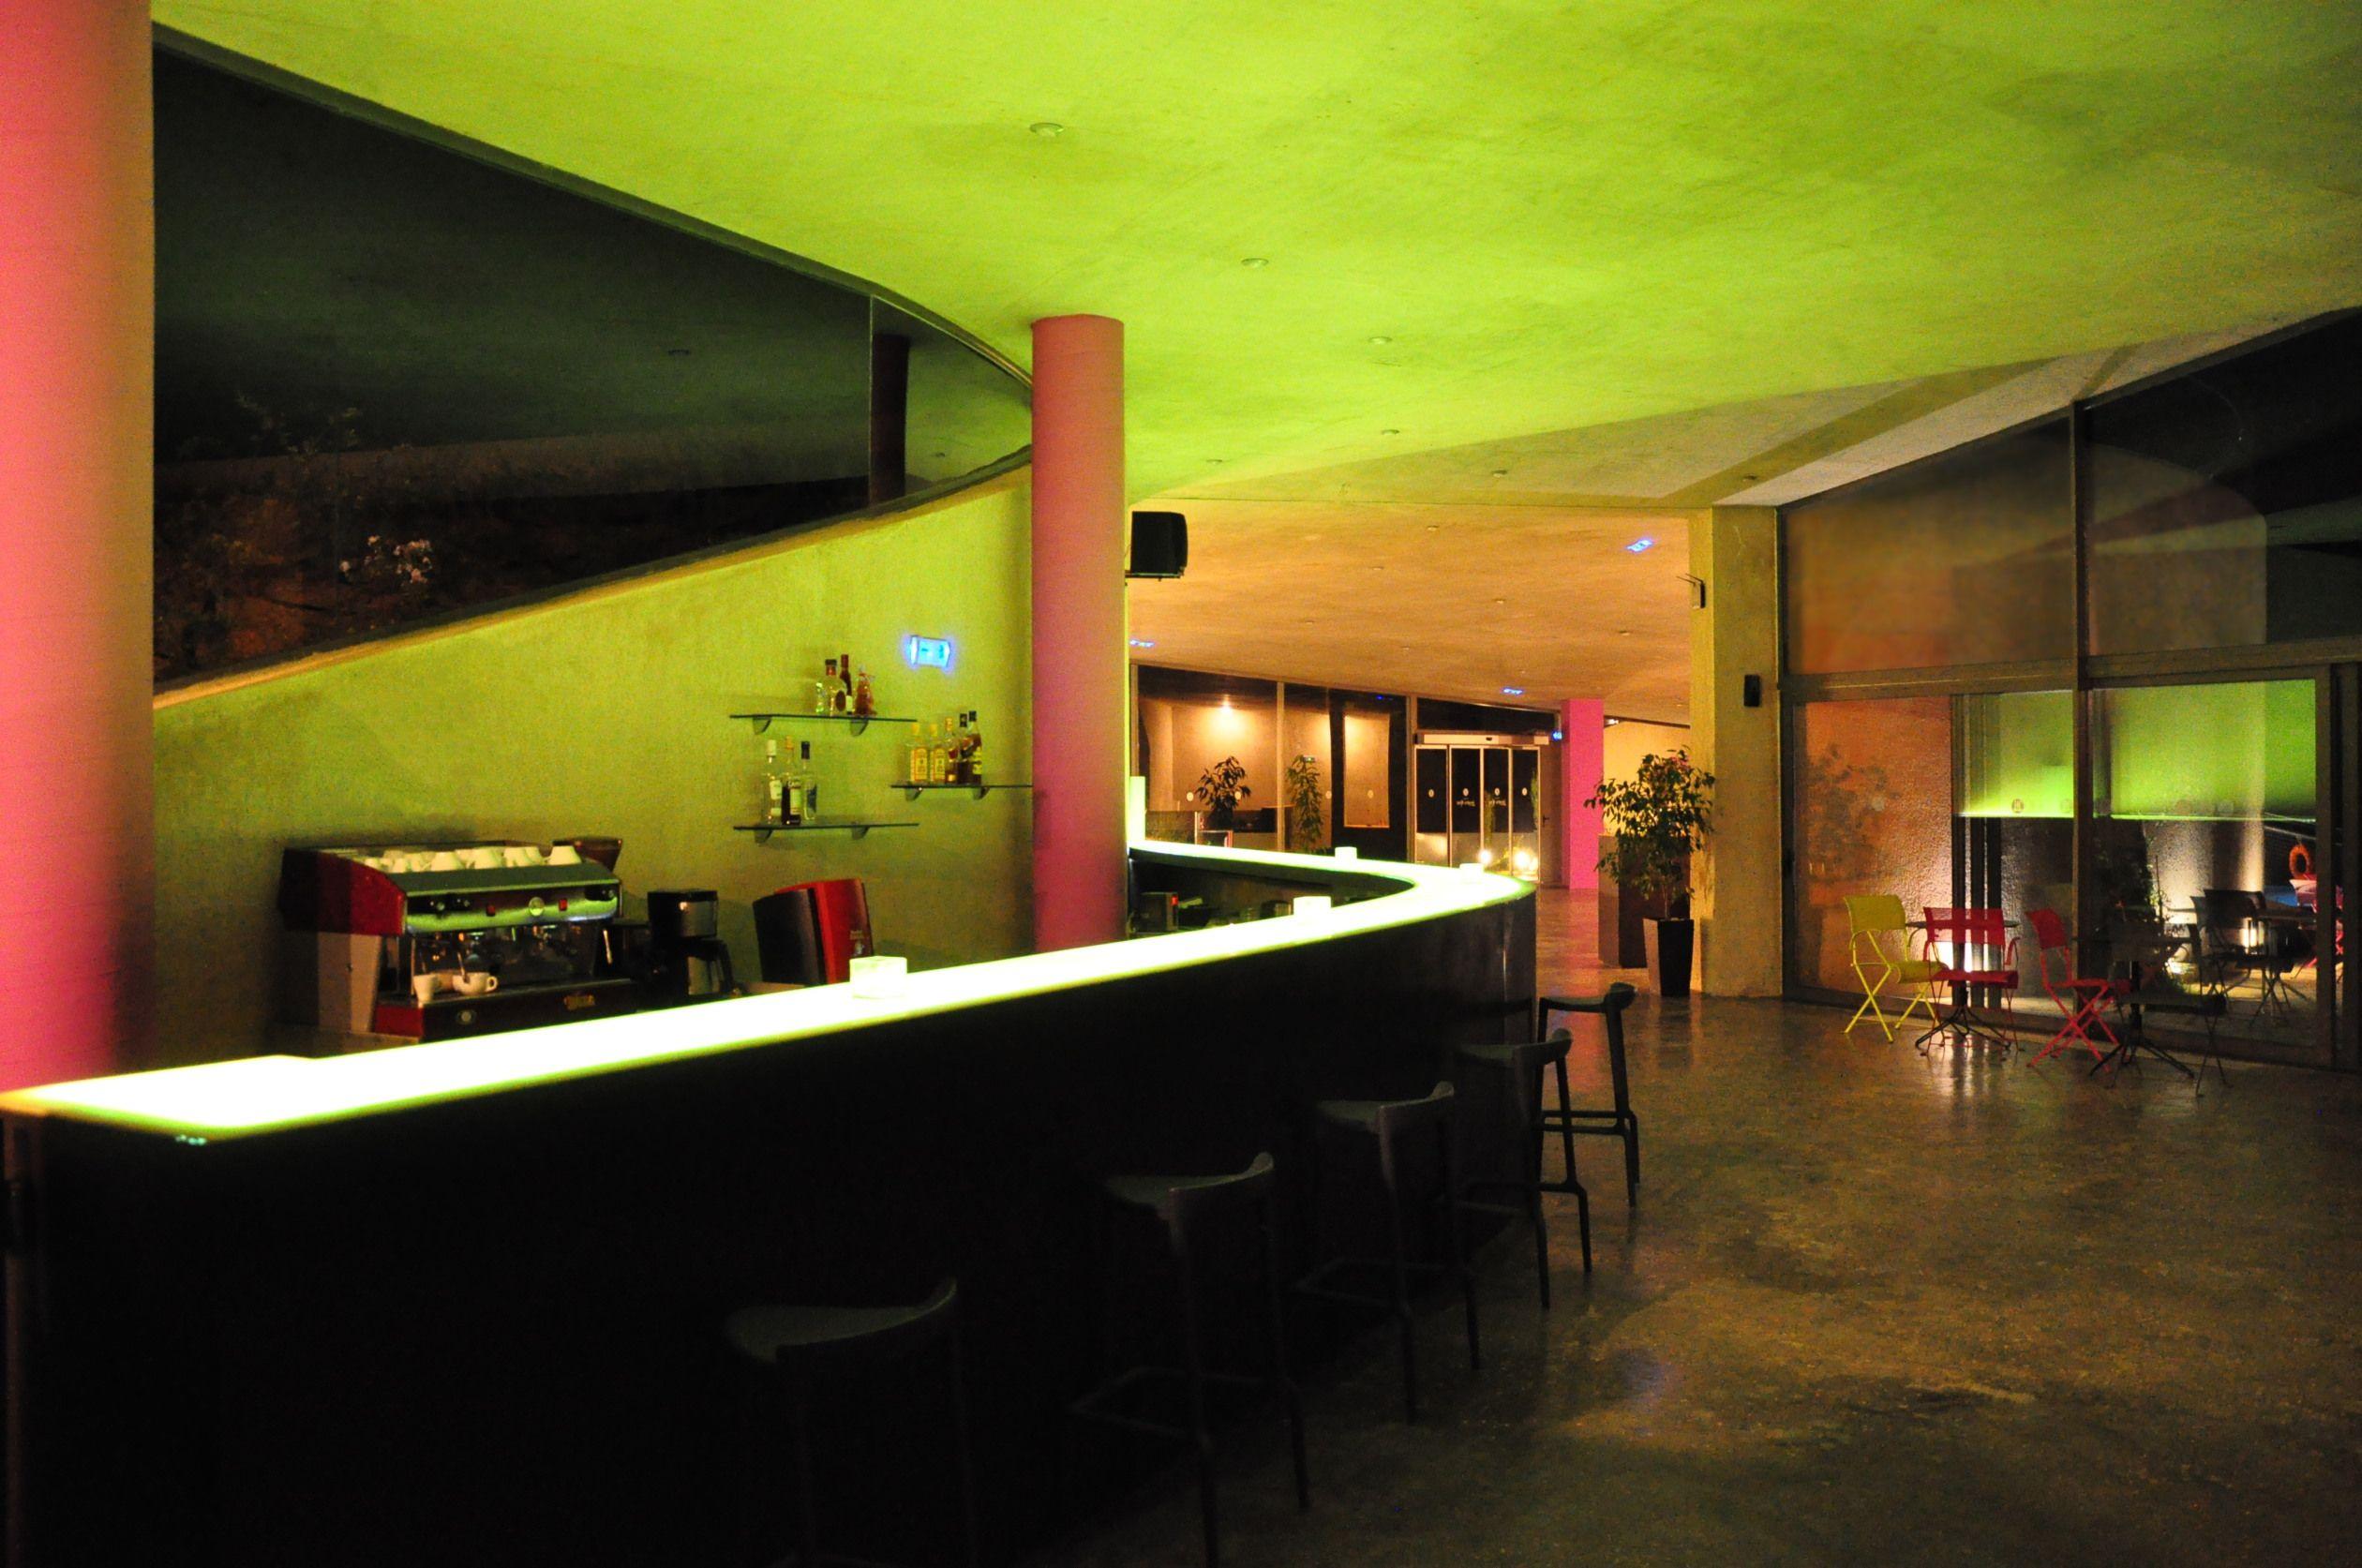 motel one hamburg-alster in hamburg | hotels i have been to, Badezimmer ideen